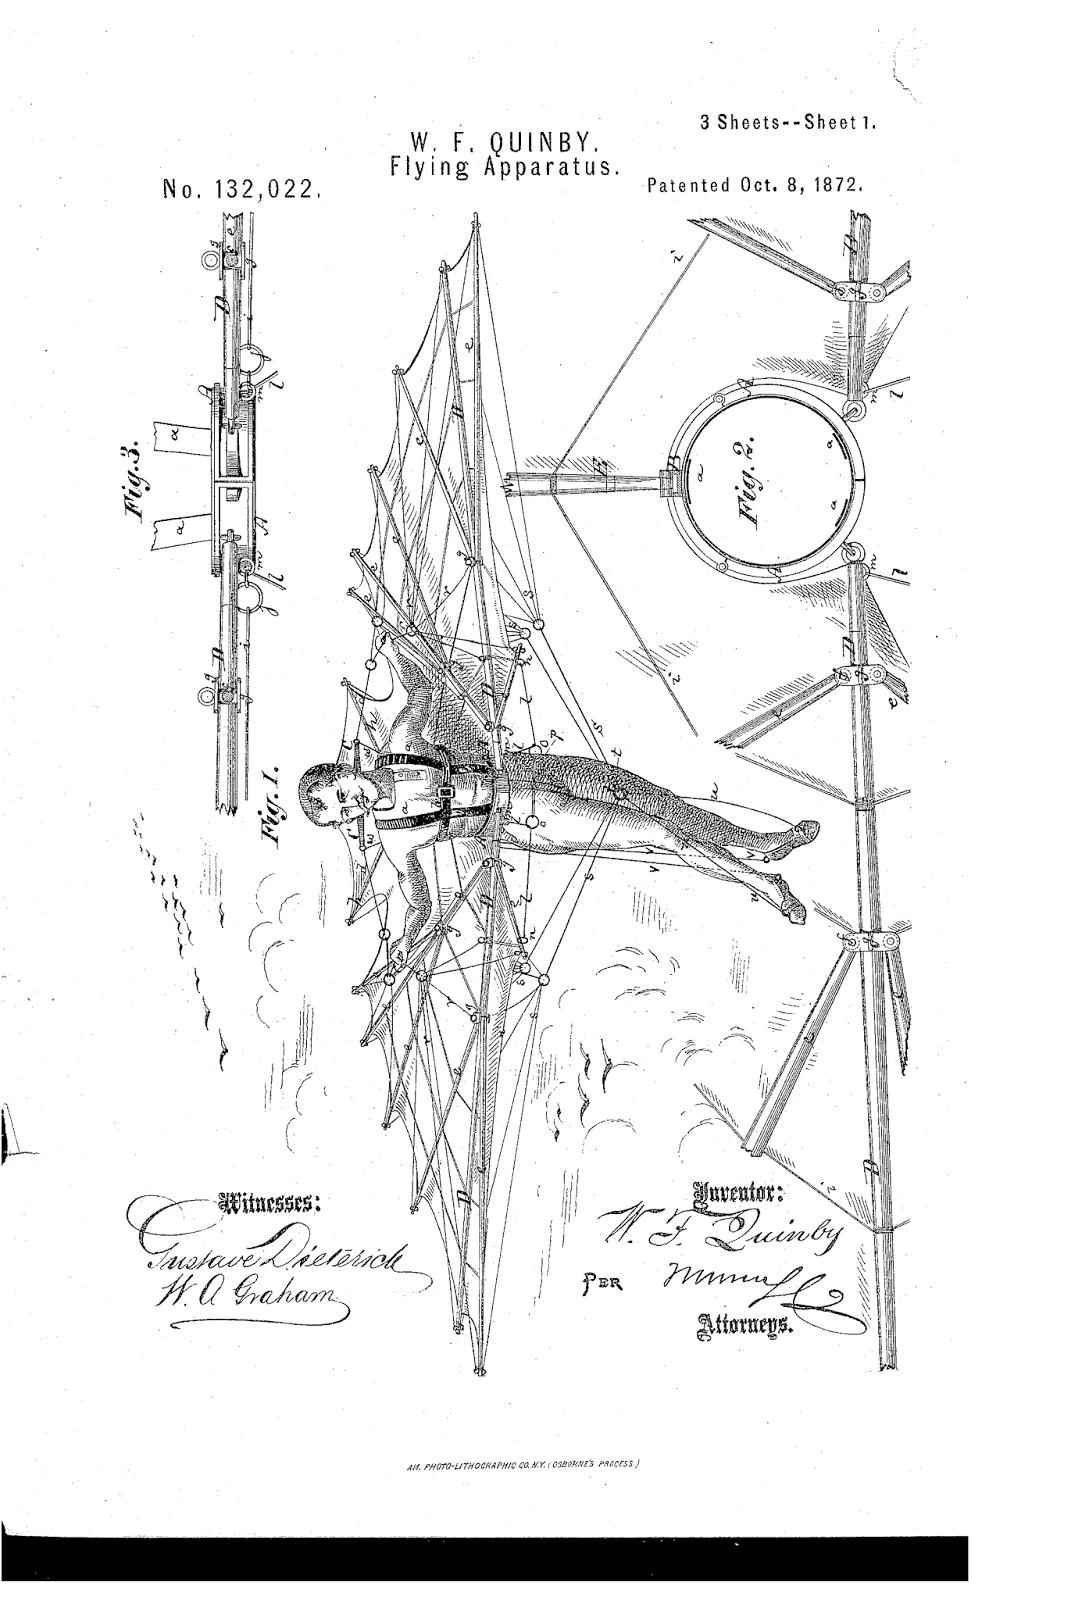 THE PATENT SEARCH BLOG: Bizarre human powered flight patents